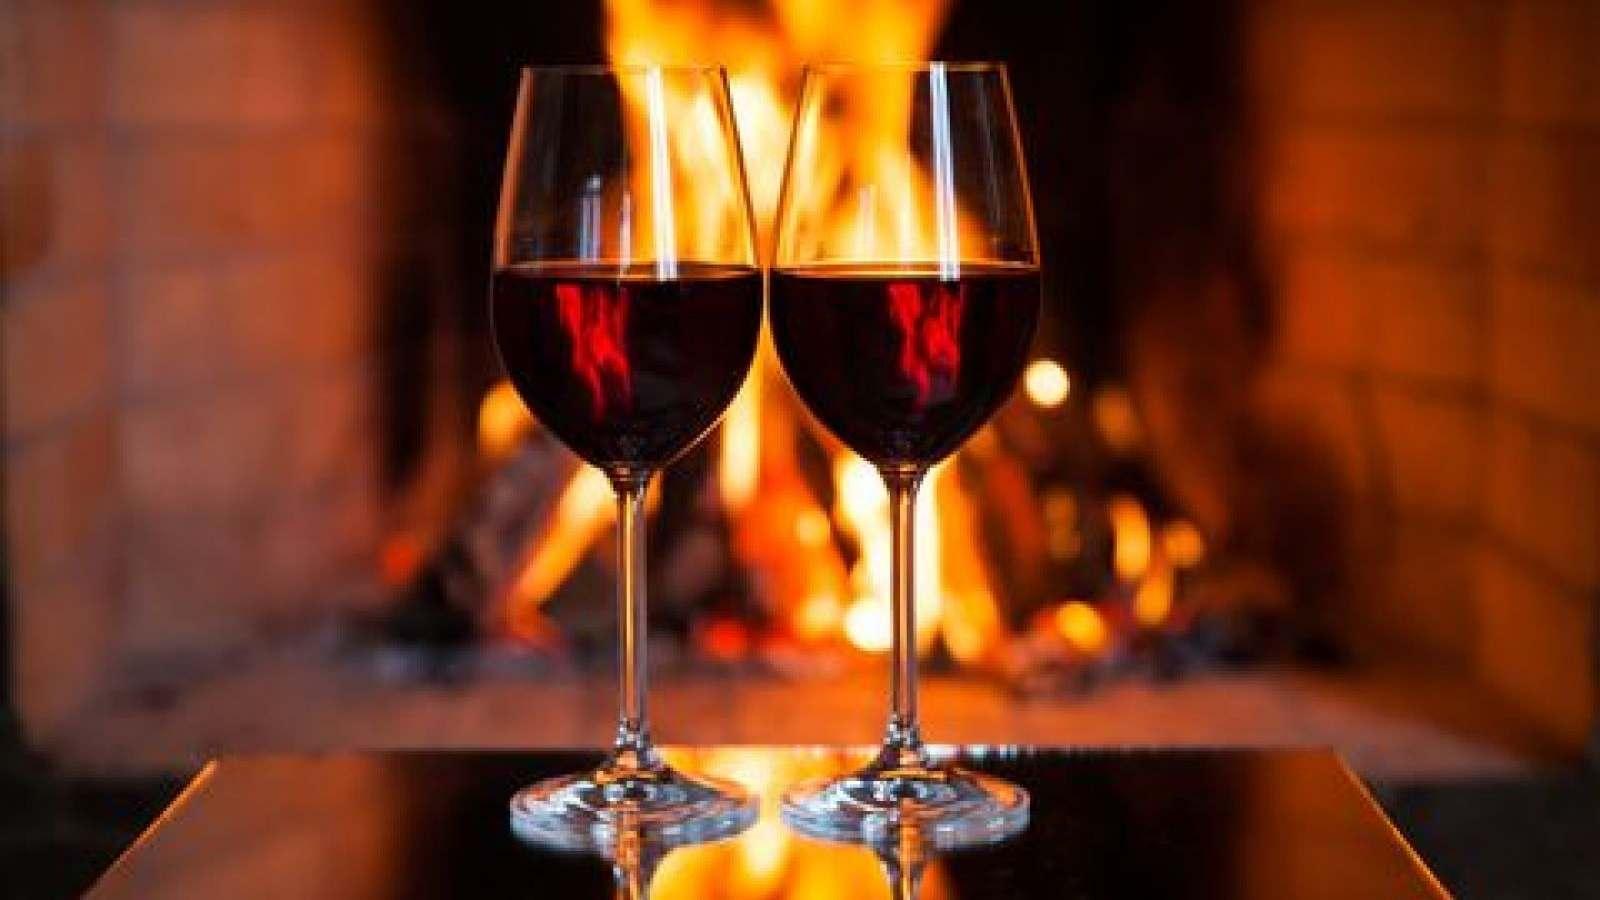 شیشه یِ ترشی و دو لیوان شراب